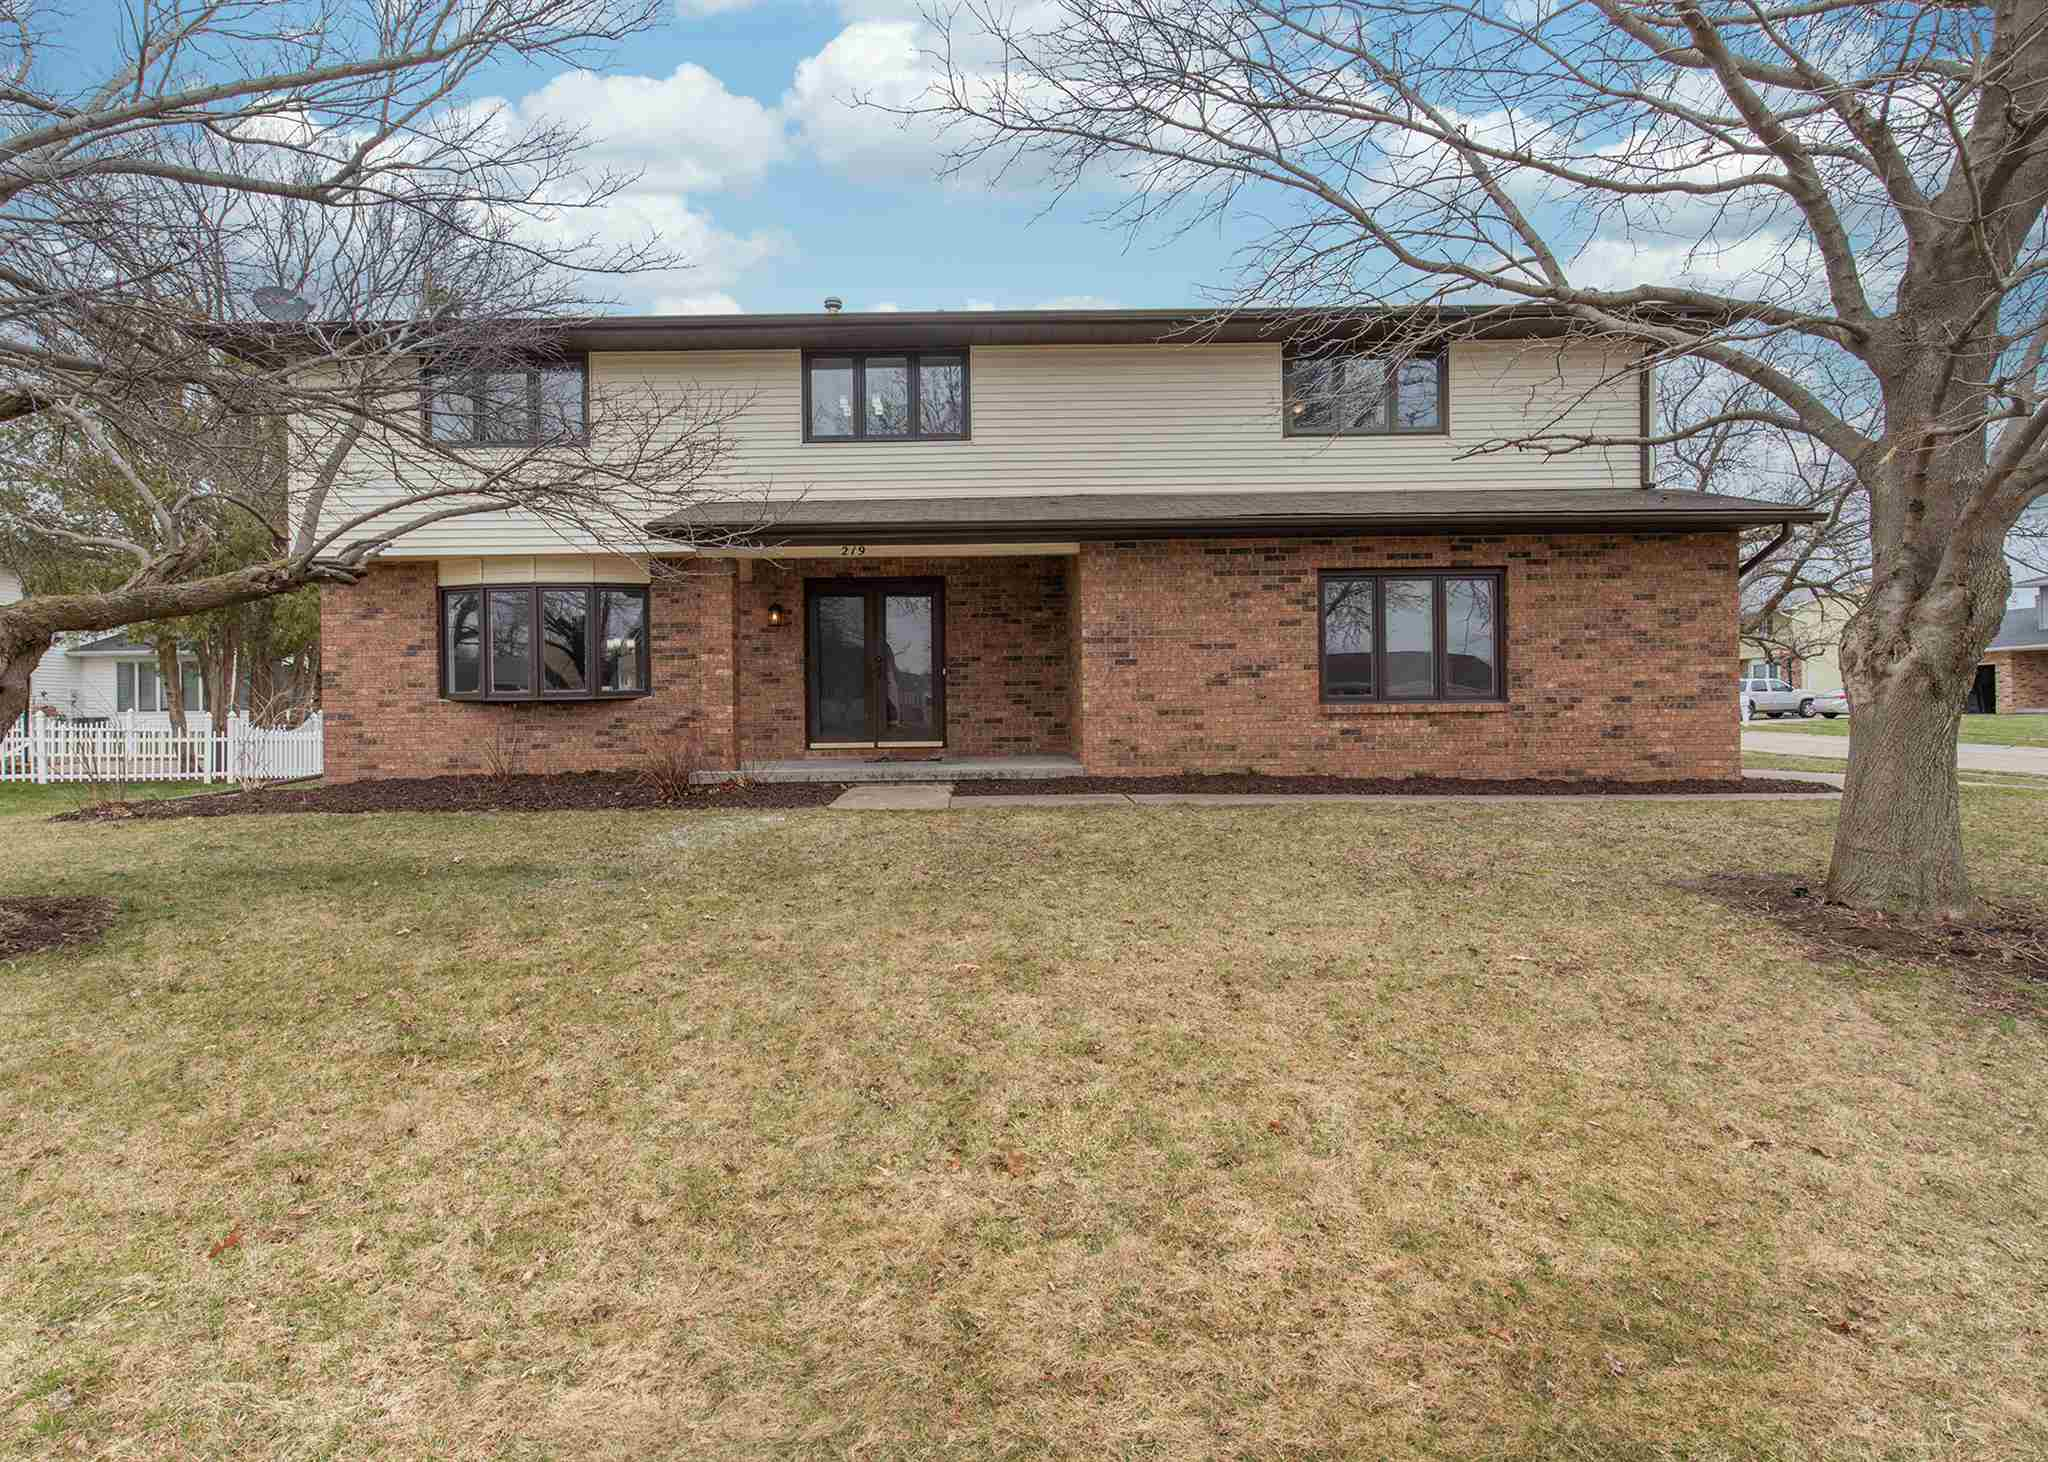 219 S 8TH Property Photo - Eldridge, IA real estate listing